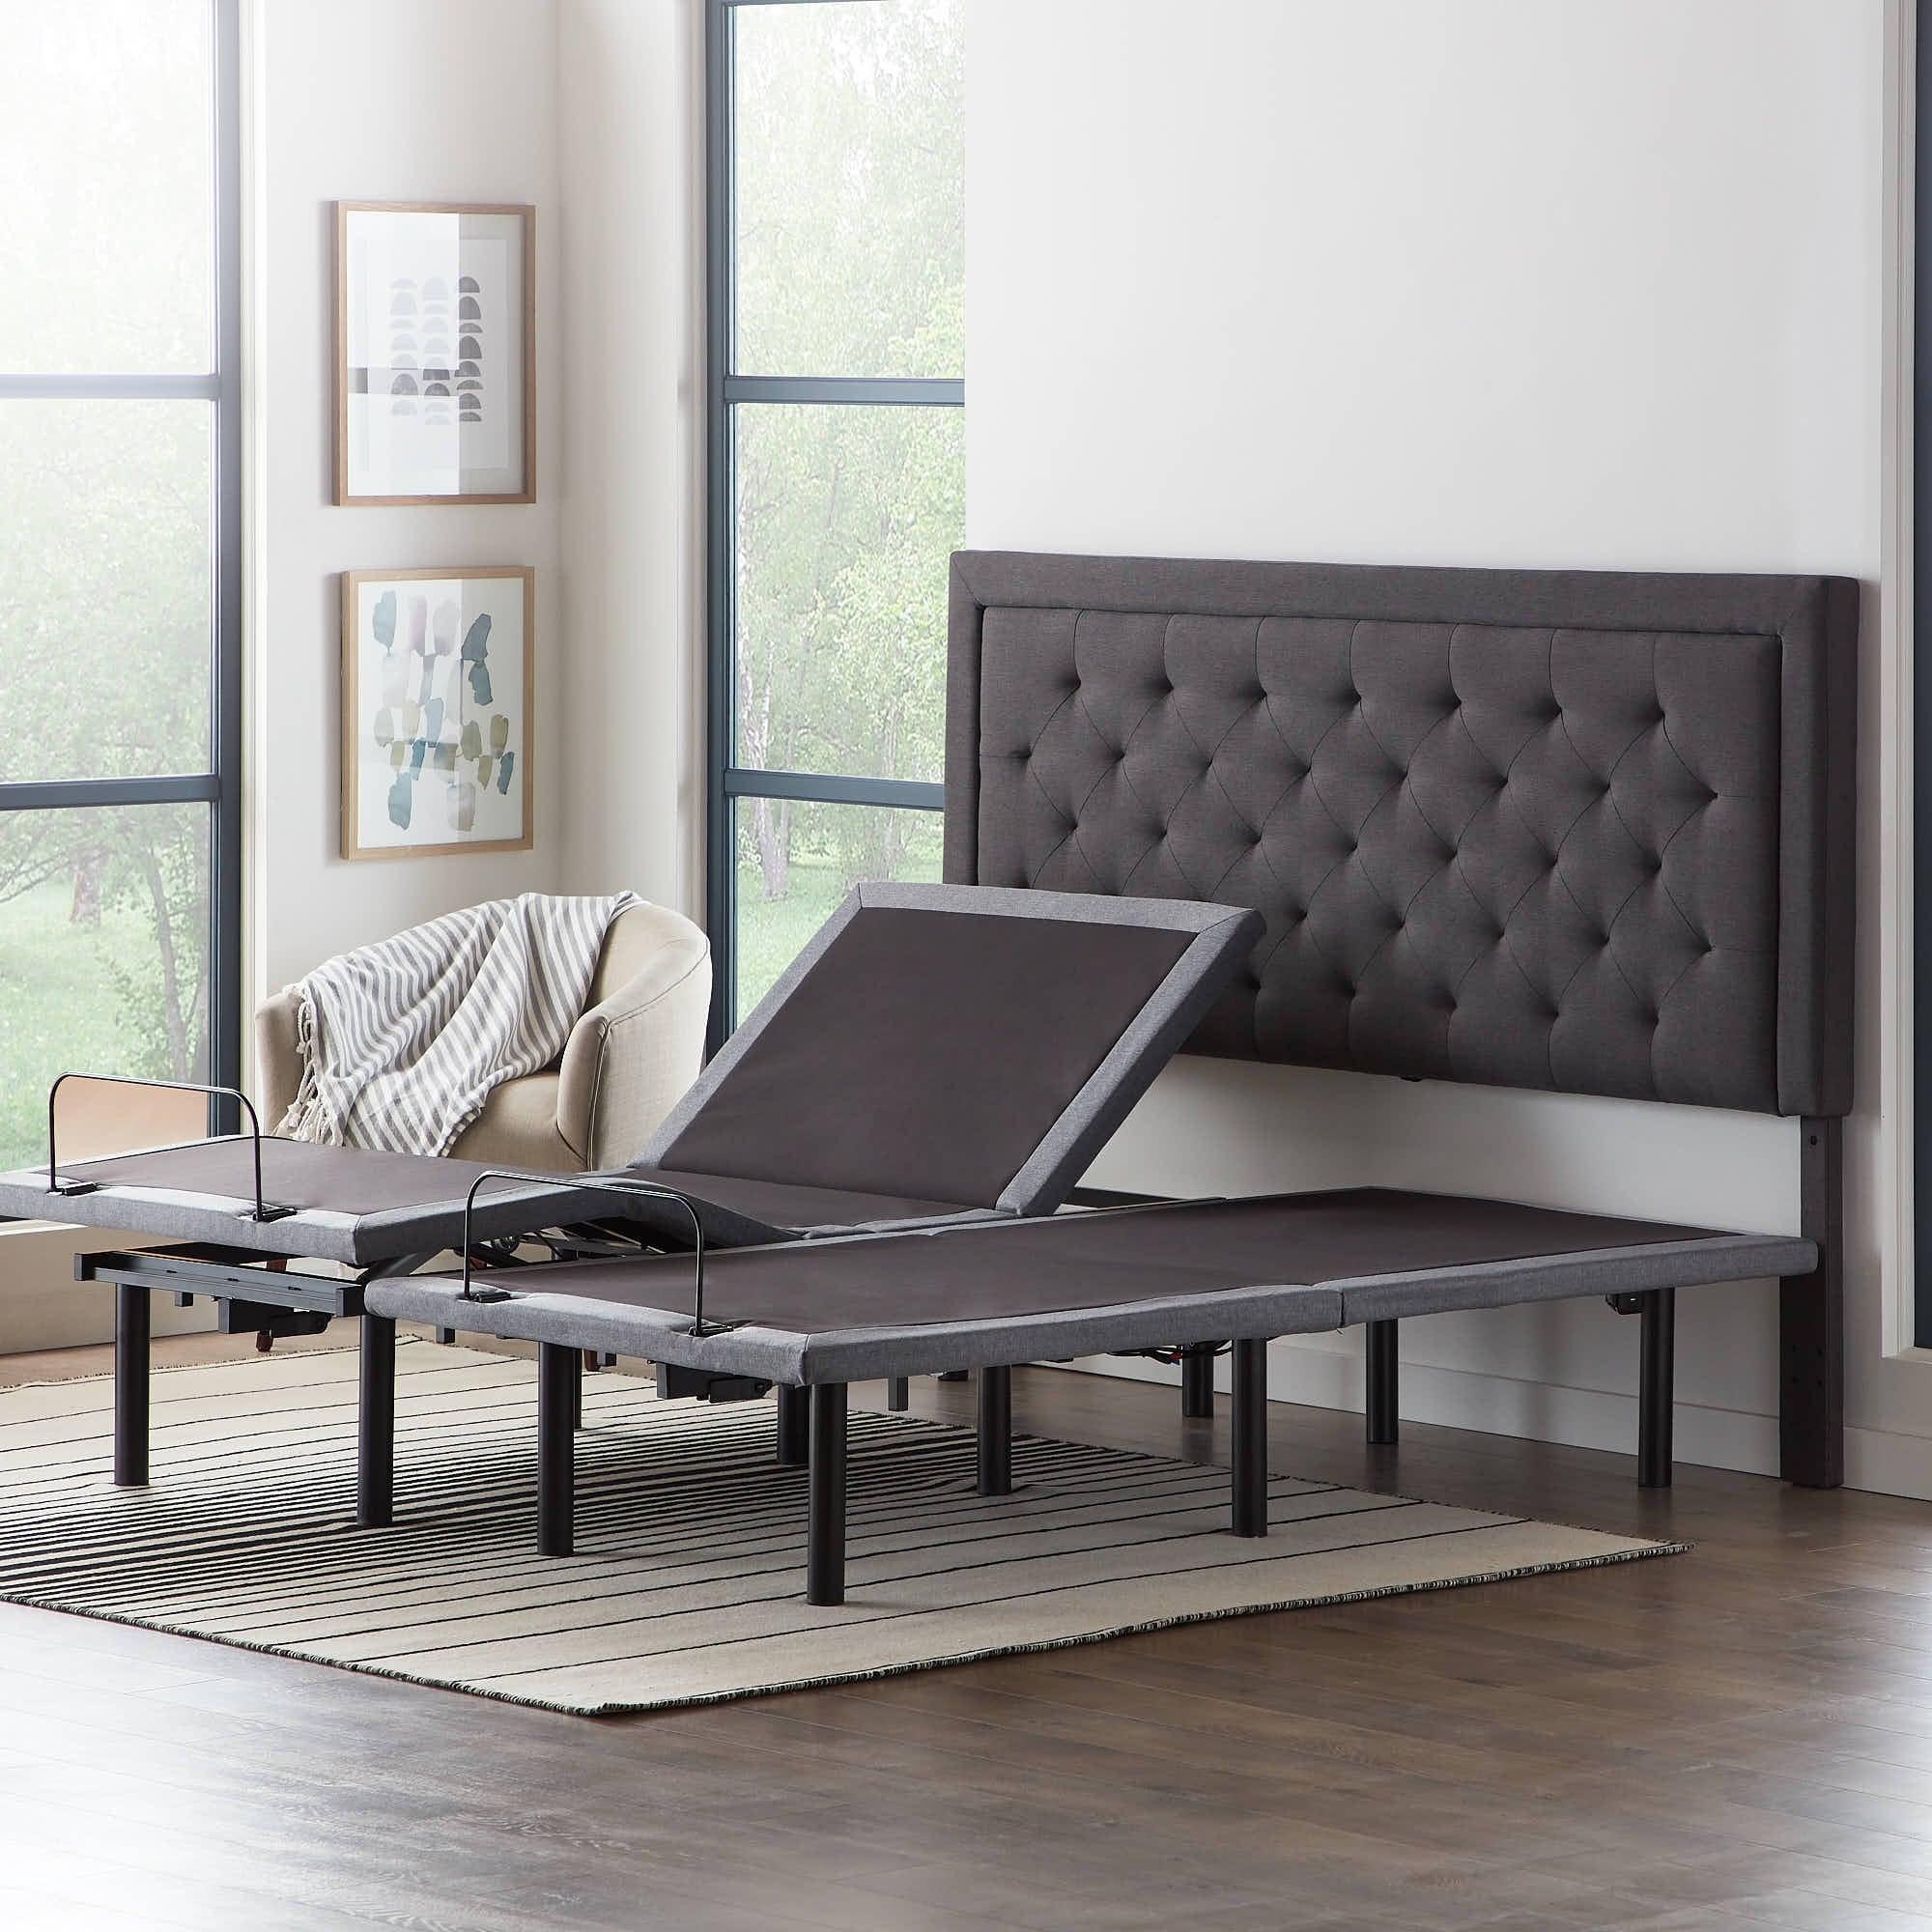 Wonderful Adjustable Bed Frame Collections